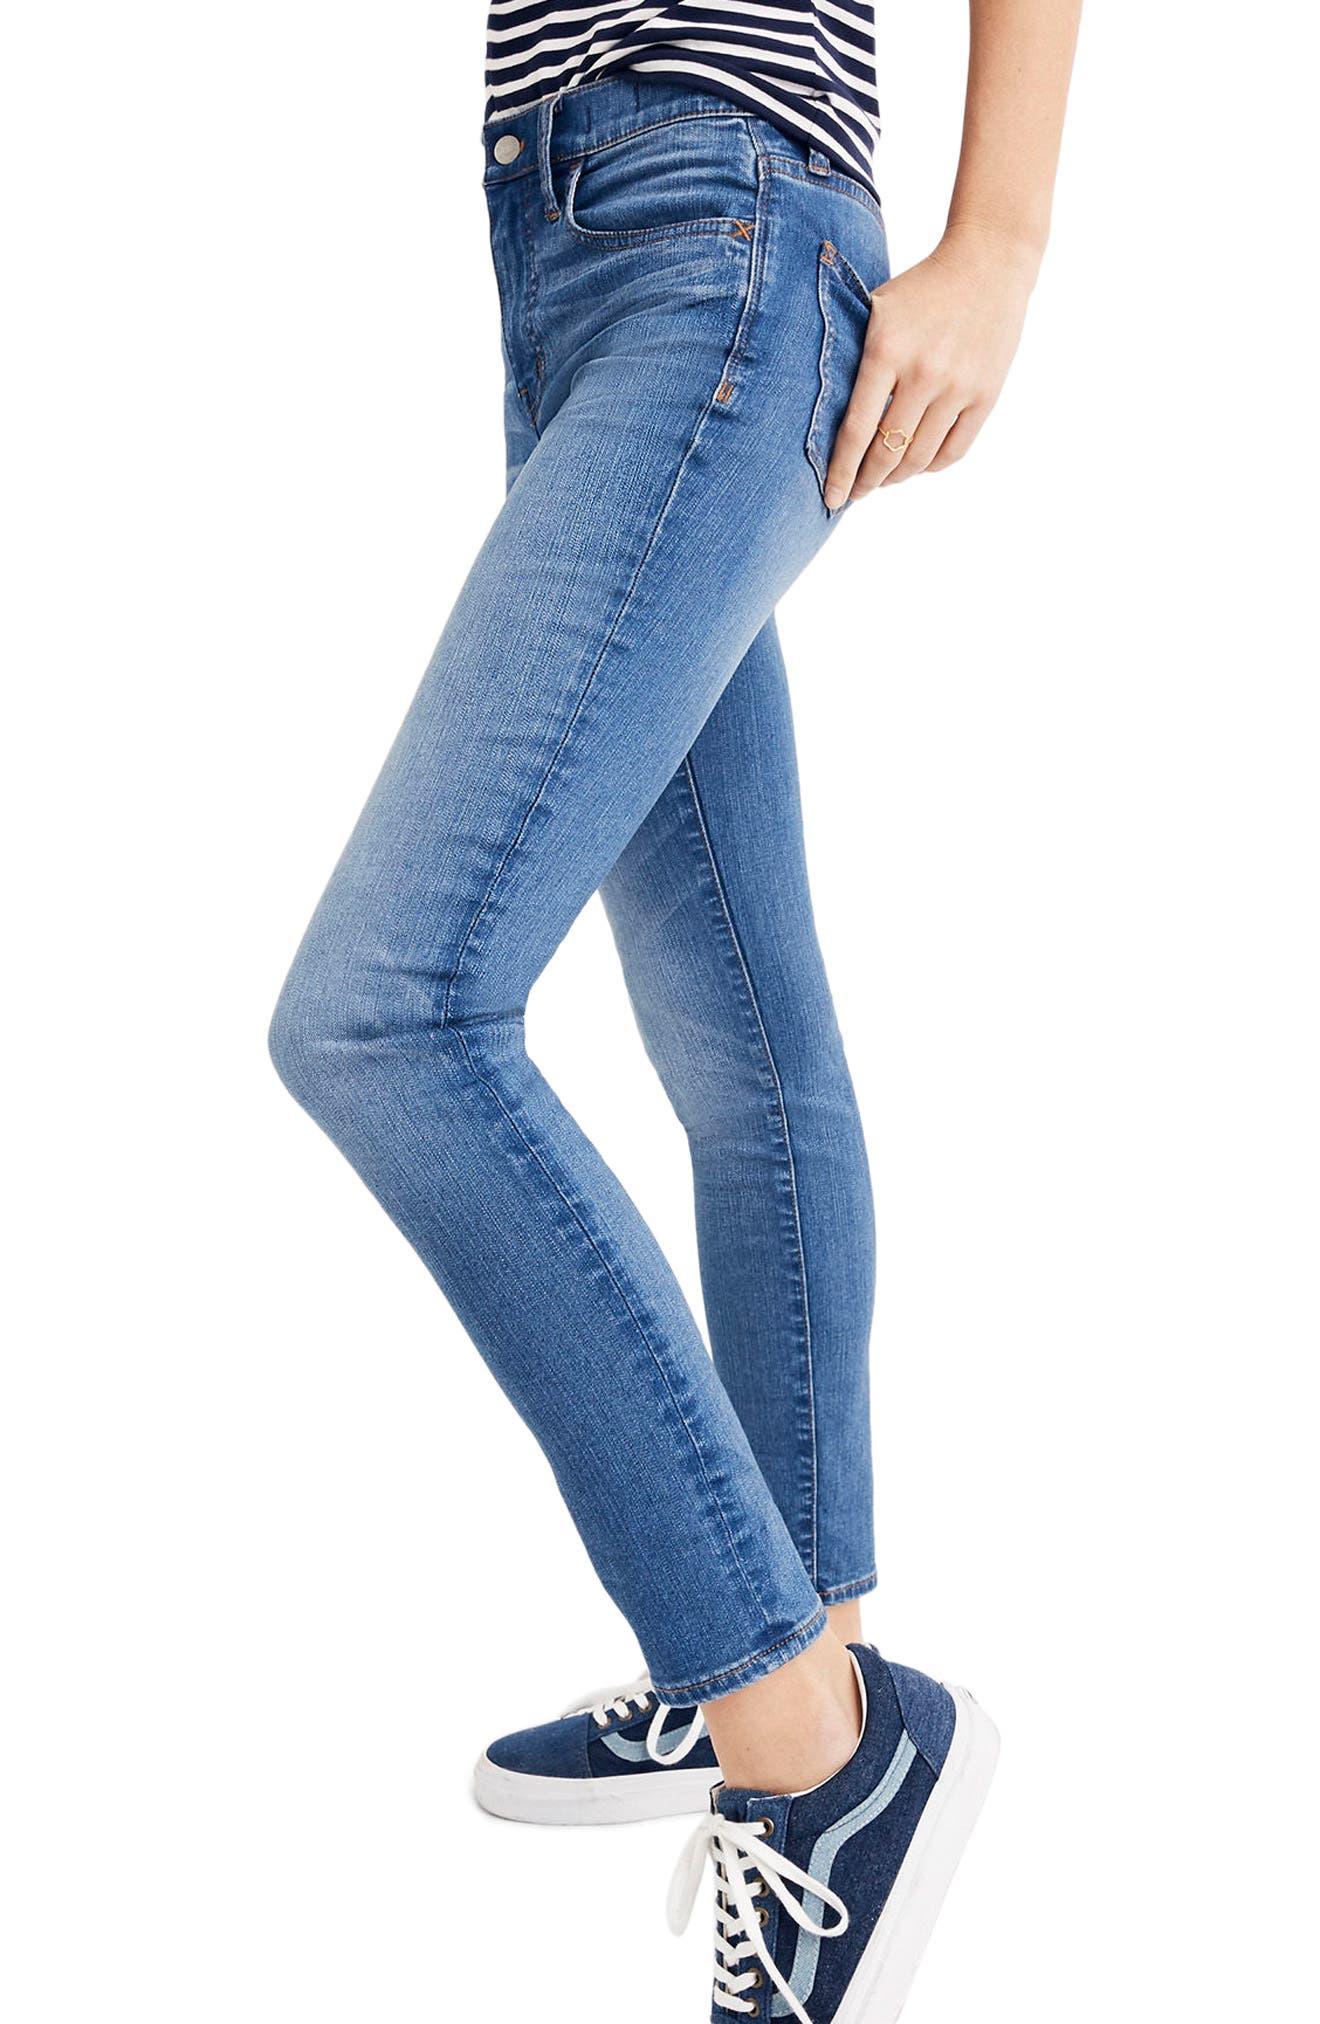 Roadtripper Crop Skinny Jeans,                             Alternate thumbnail 3, color,                             Declan Wash